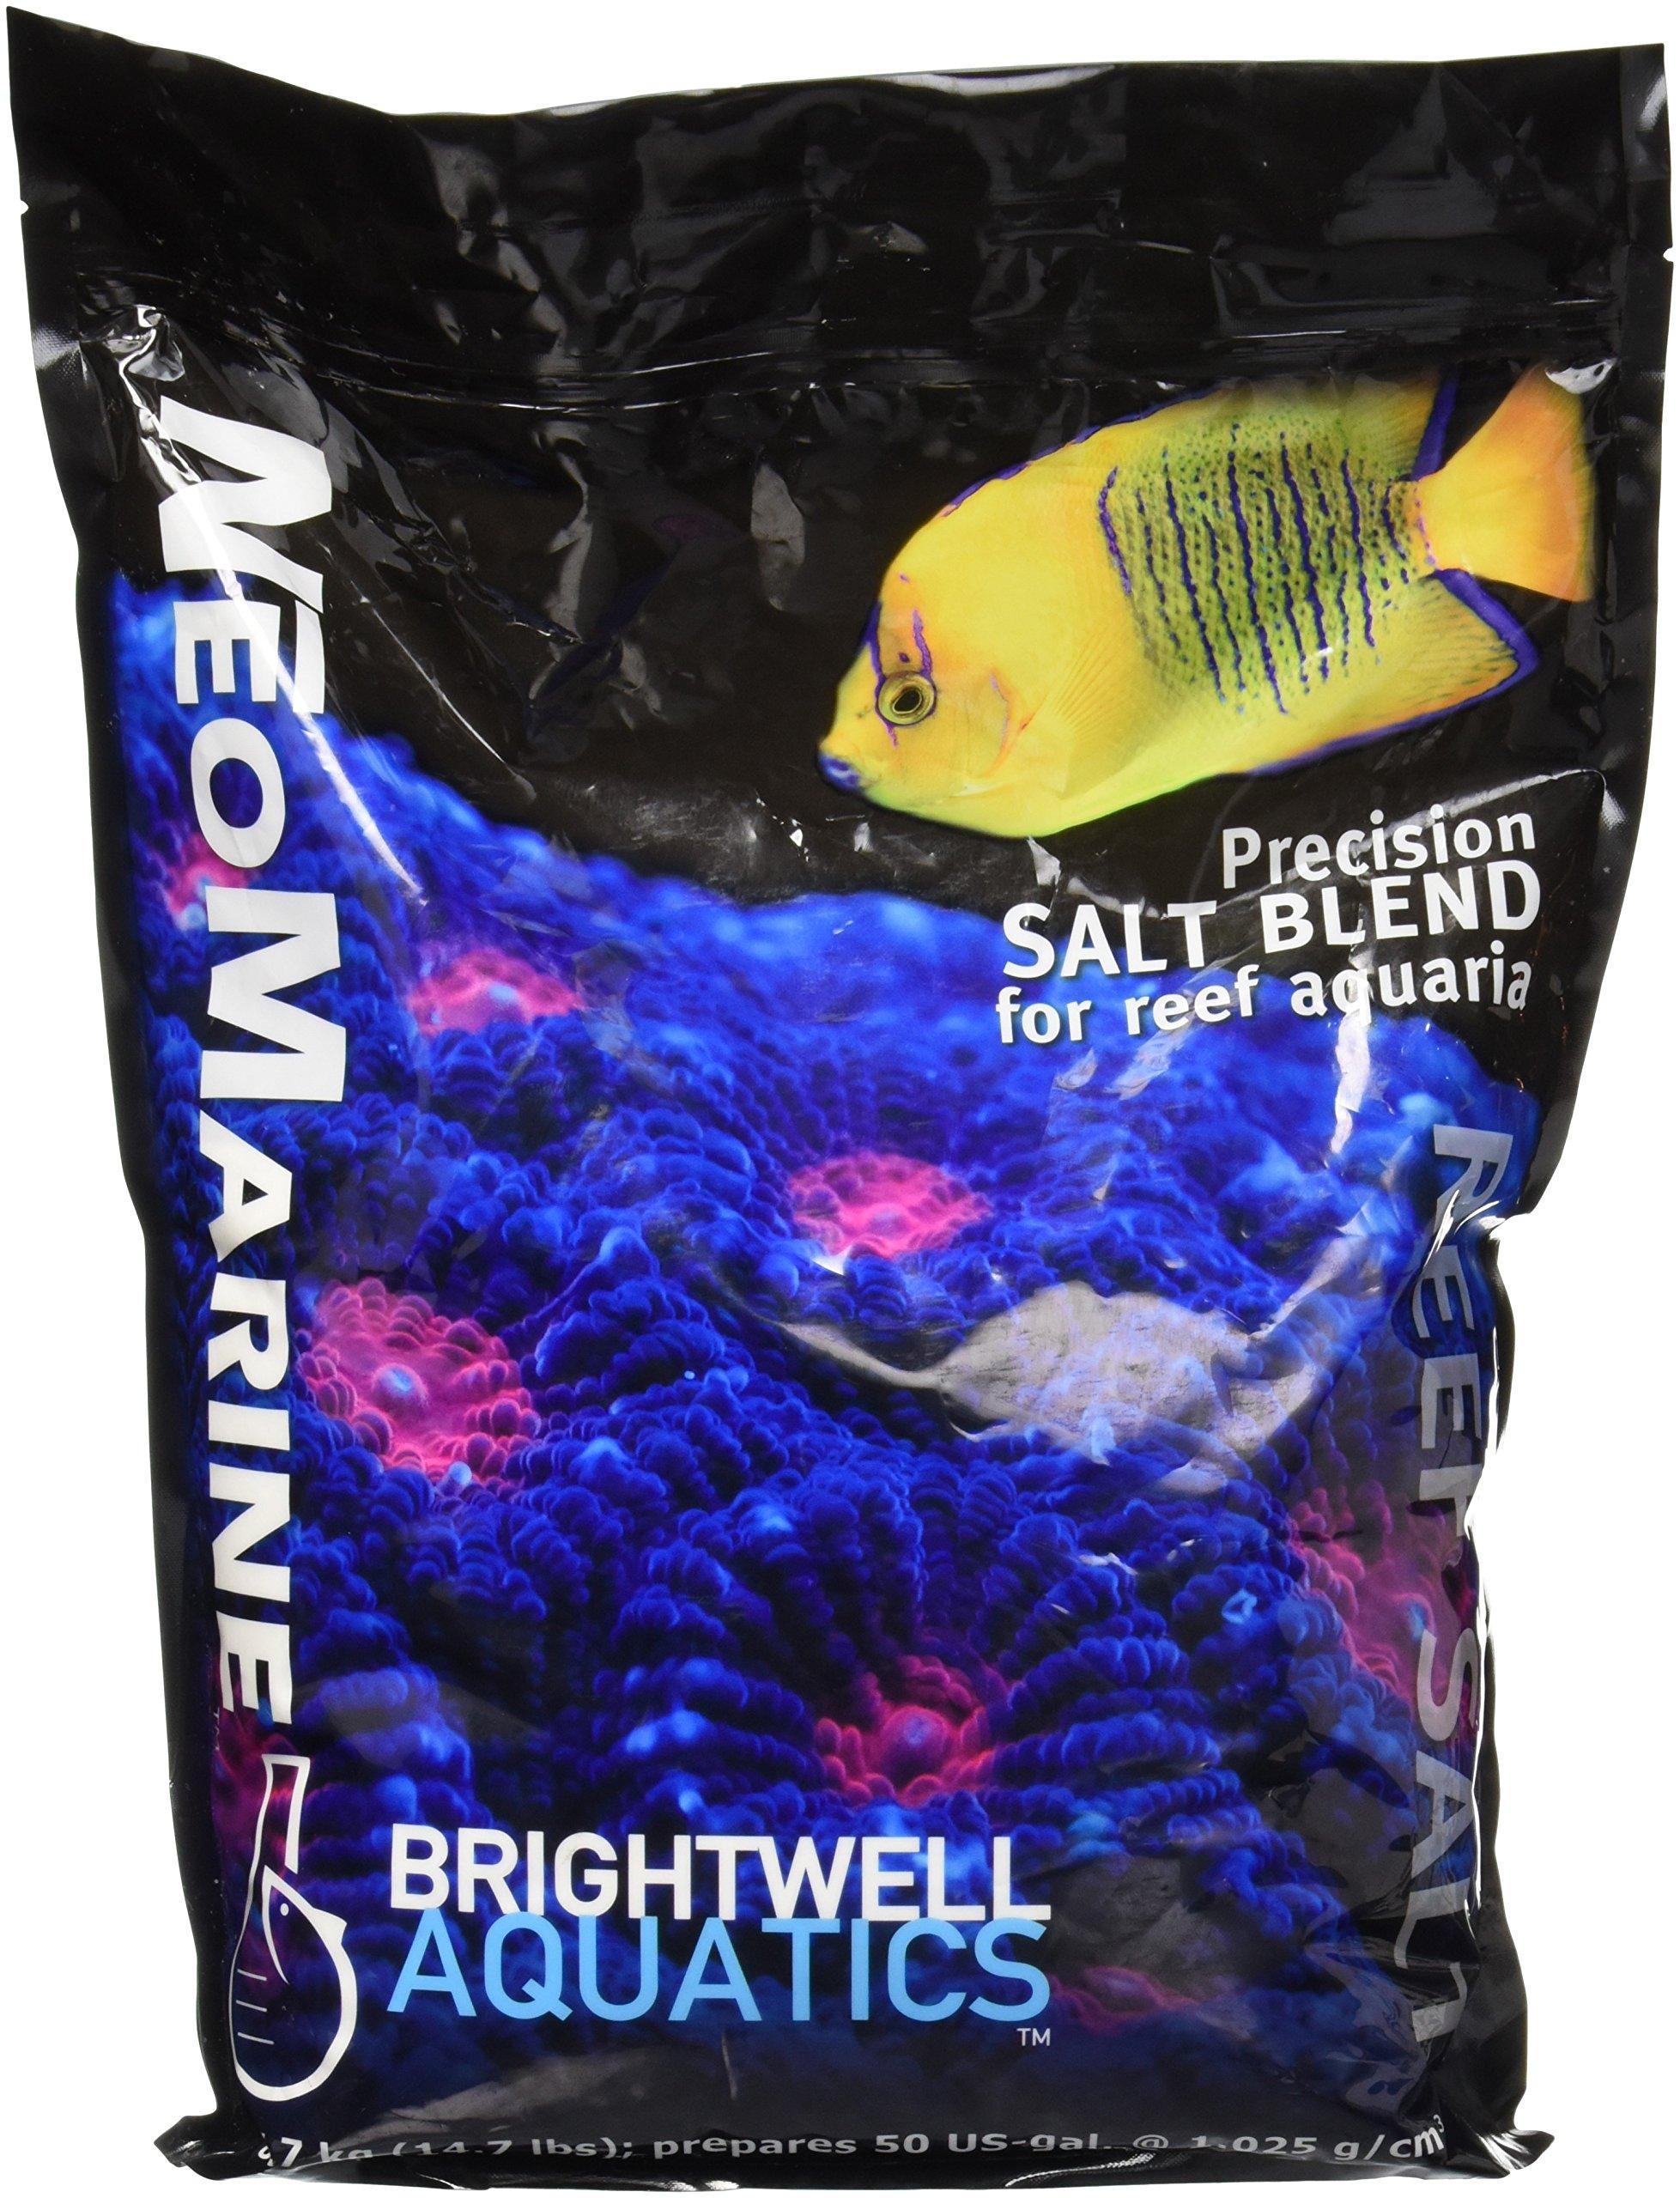 Brightwell Aquatics ABANMAR50 Neomarine Marine Salt, 50-Gallon